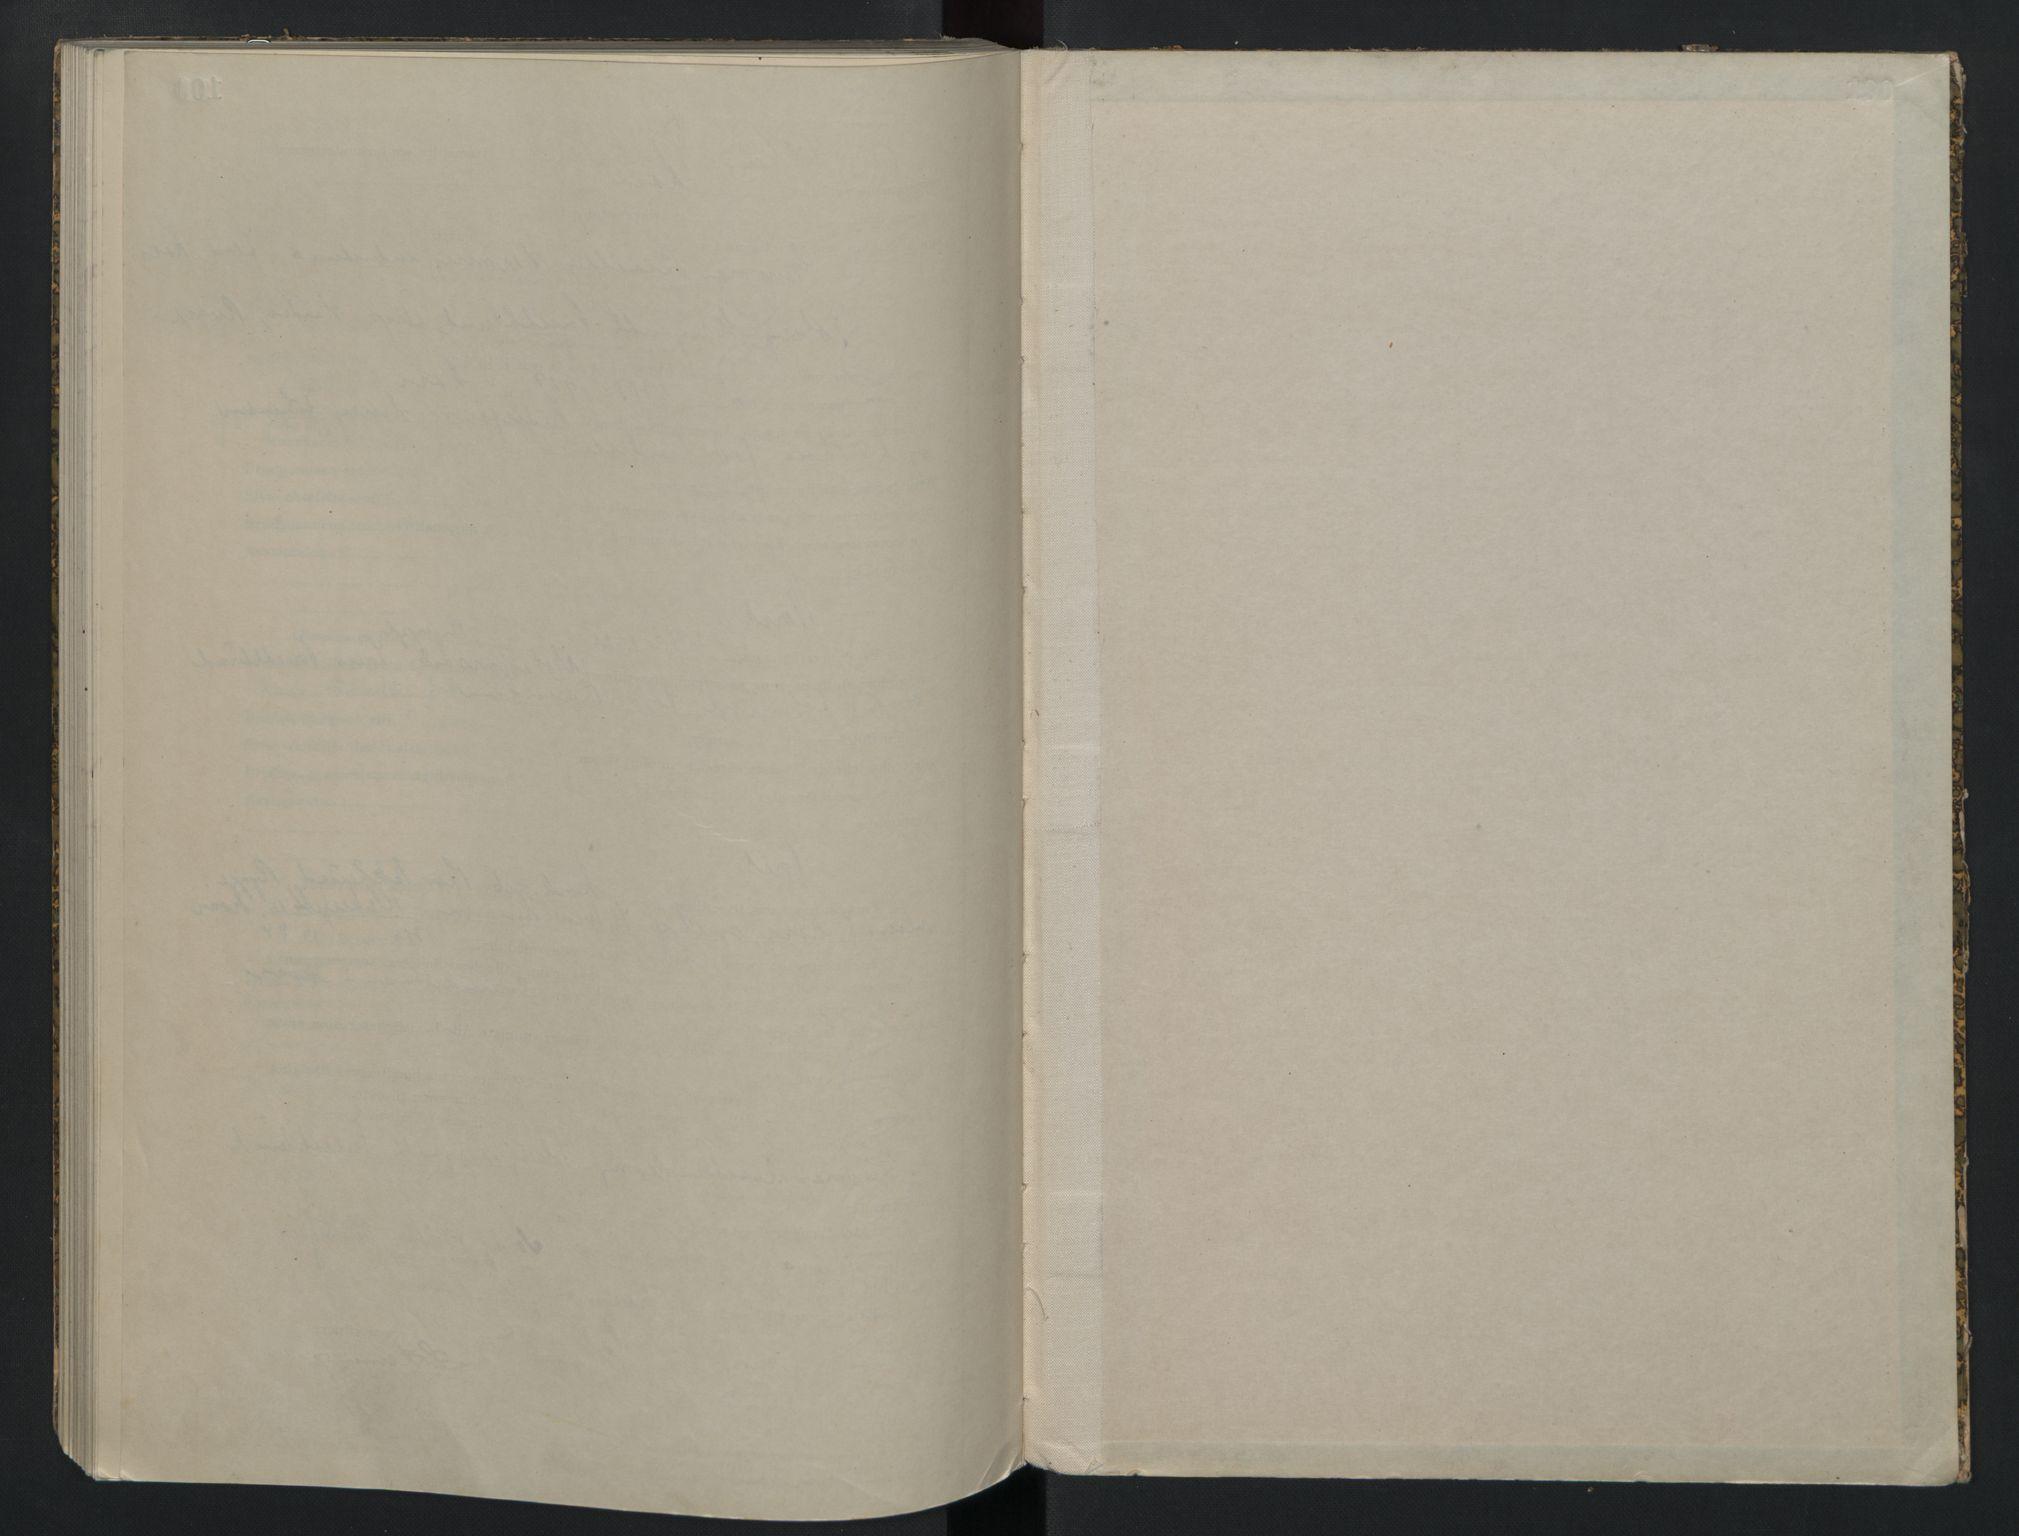 SAO, Moss sorenskriveri, 1943-1944, s. upaginert